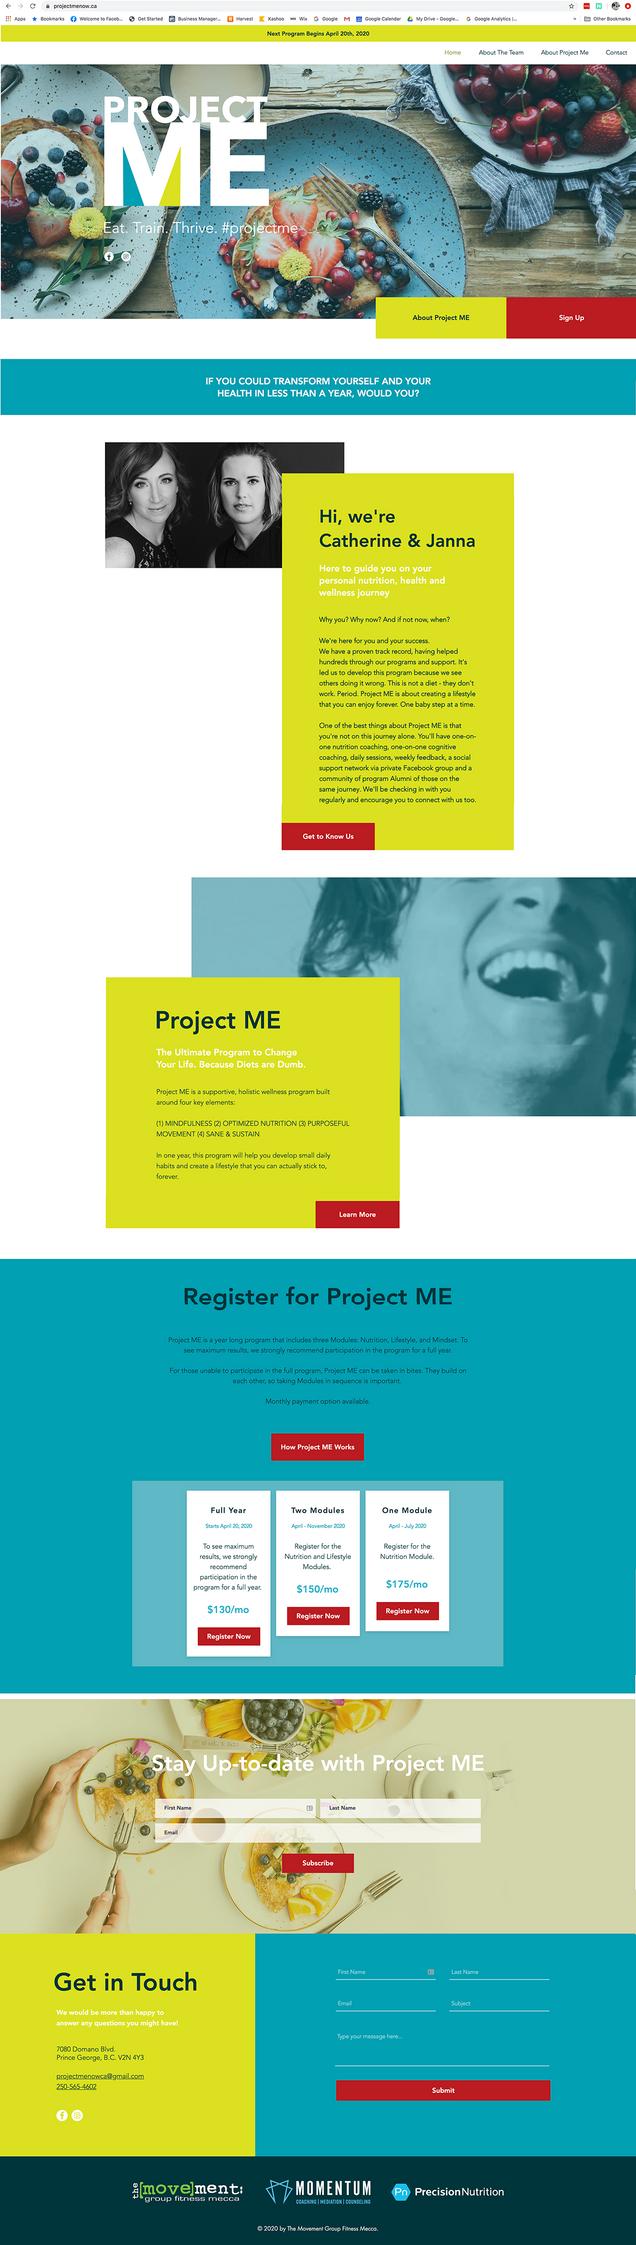 Project Me Website